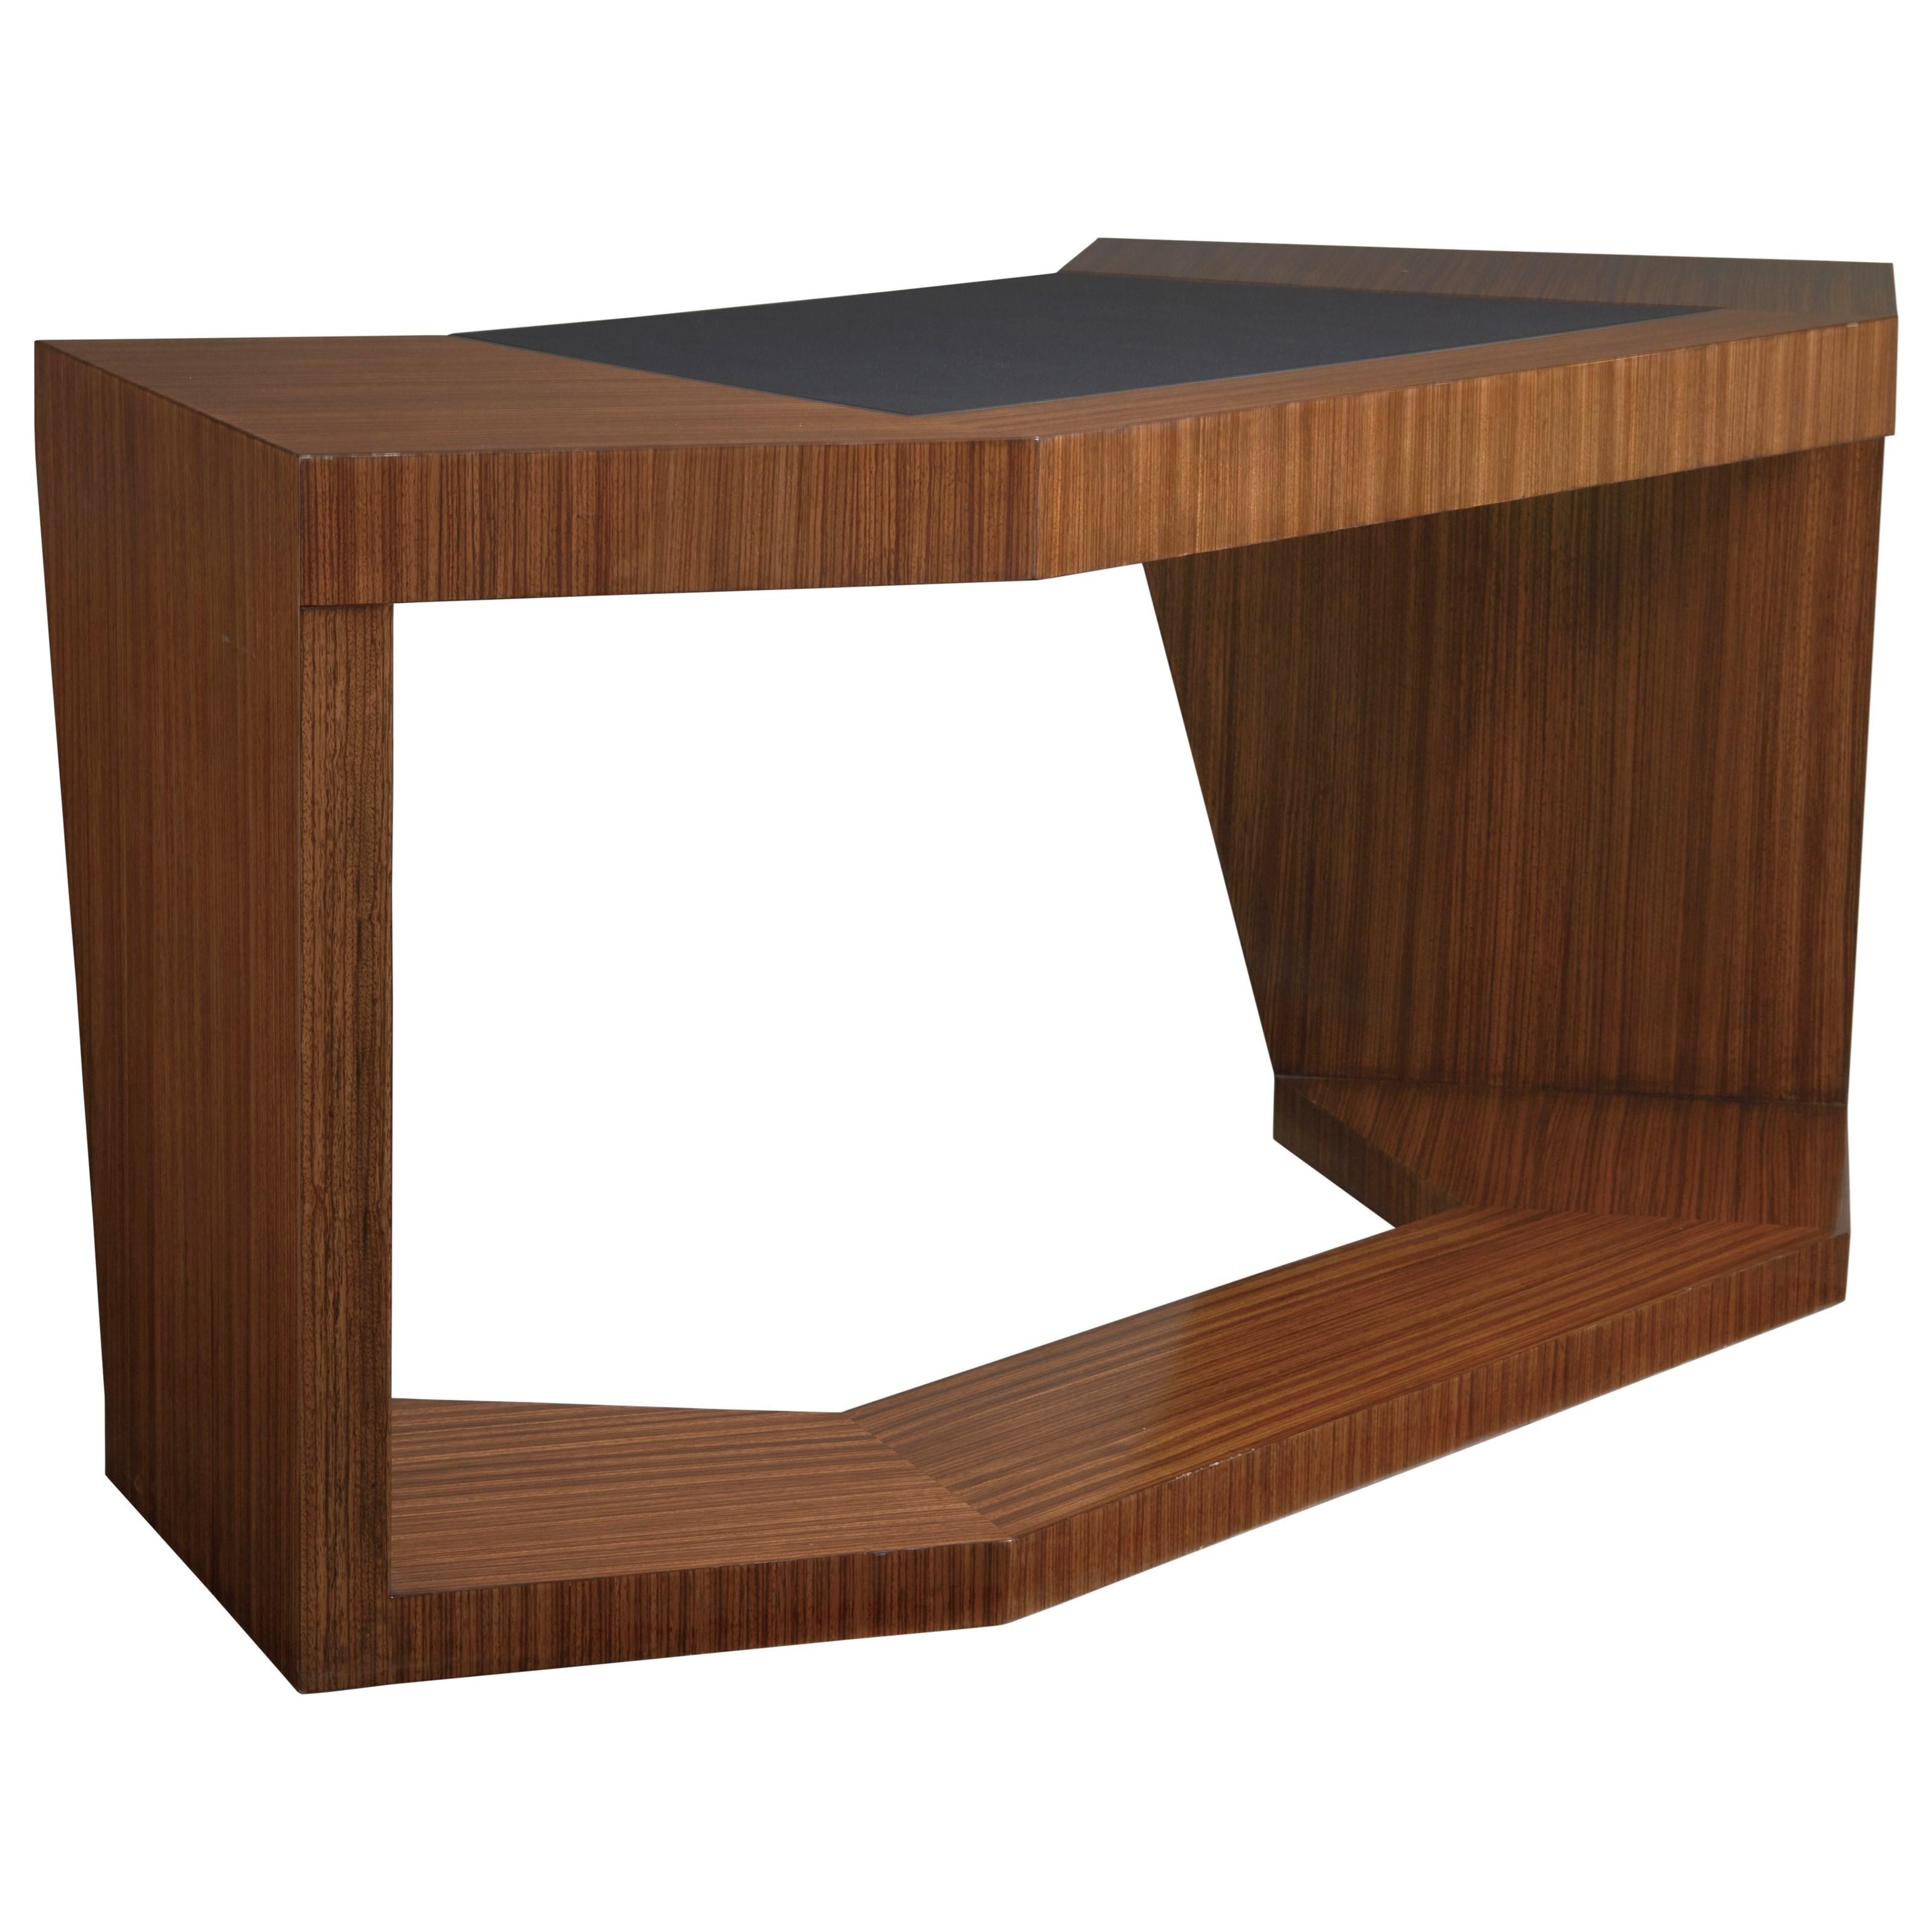 Aventura Angled Writing Desk by Sligh at Baer's Furniture